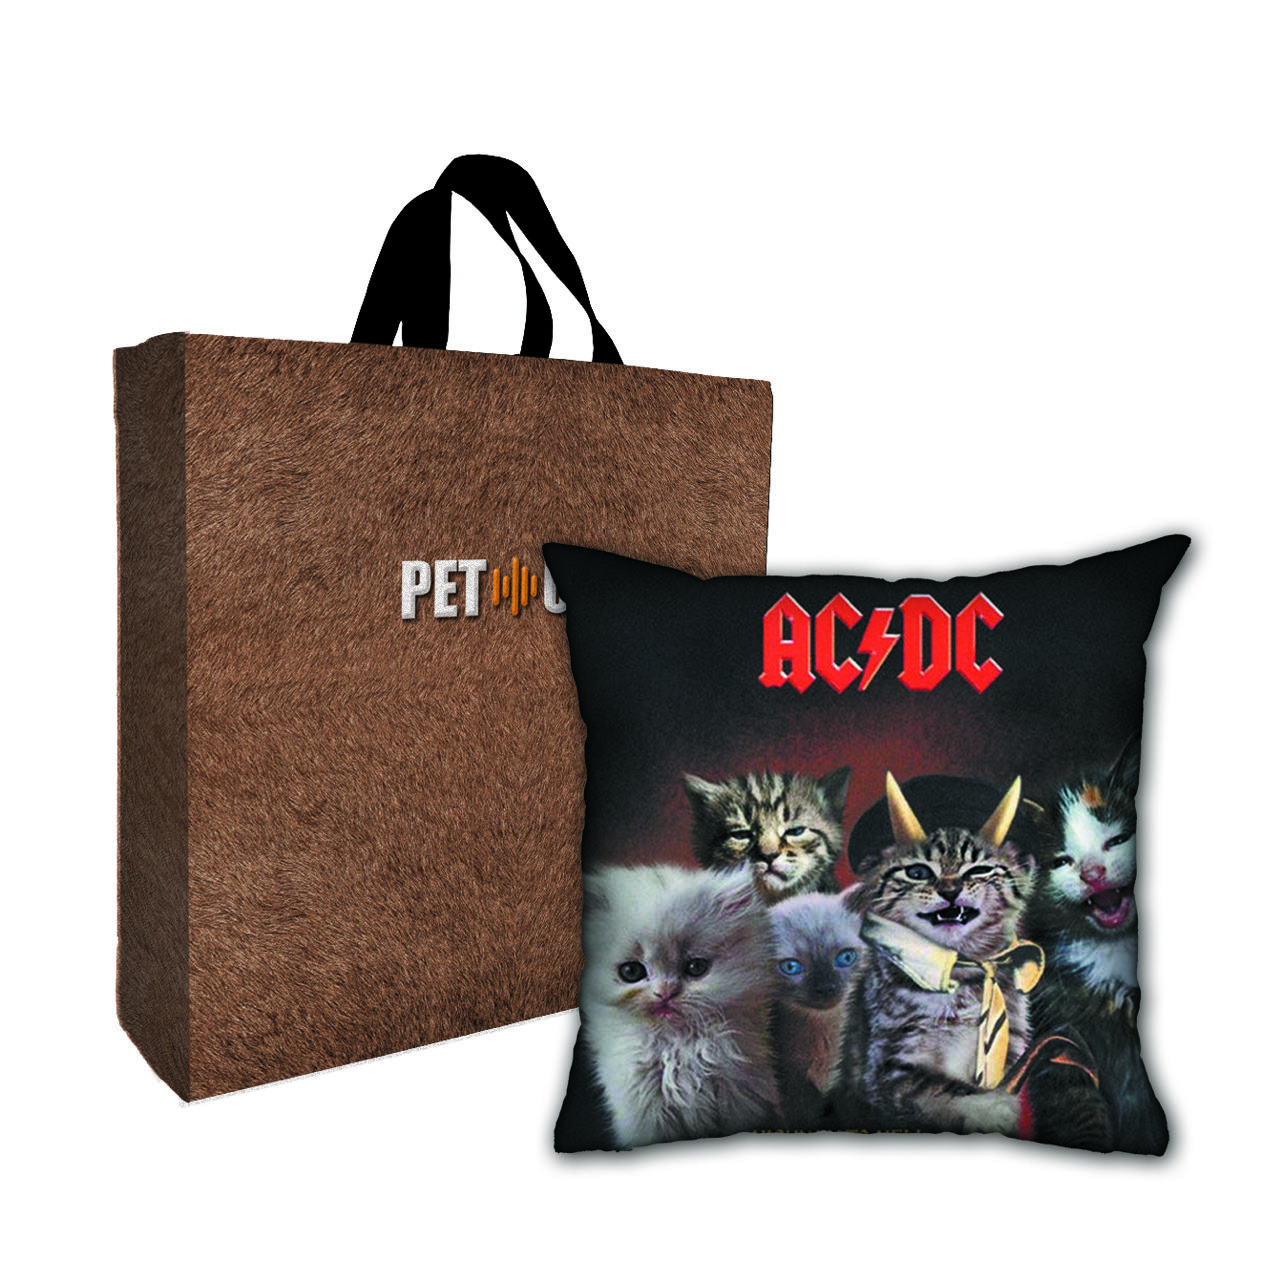 Kit Almofada & Sacola Bege Pet Use - Catway to Hell - Gatos